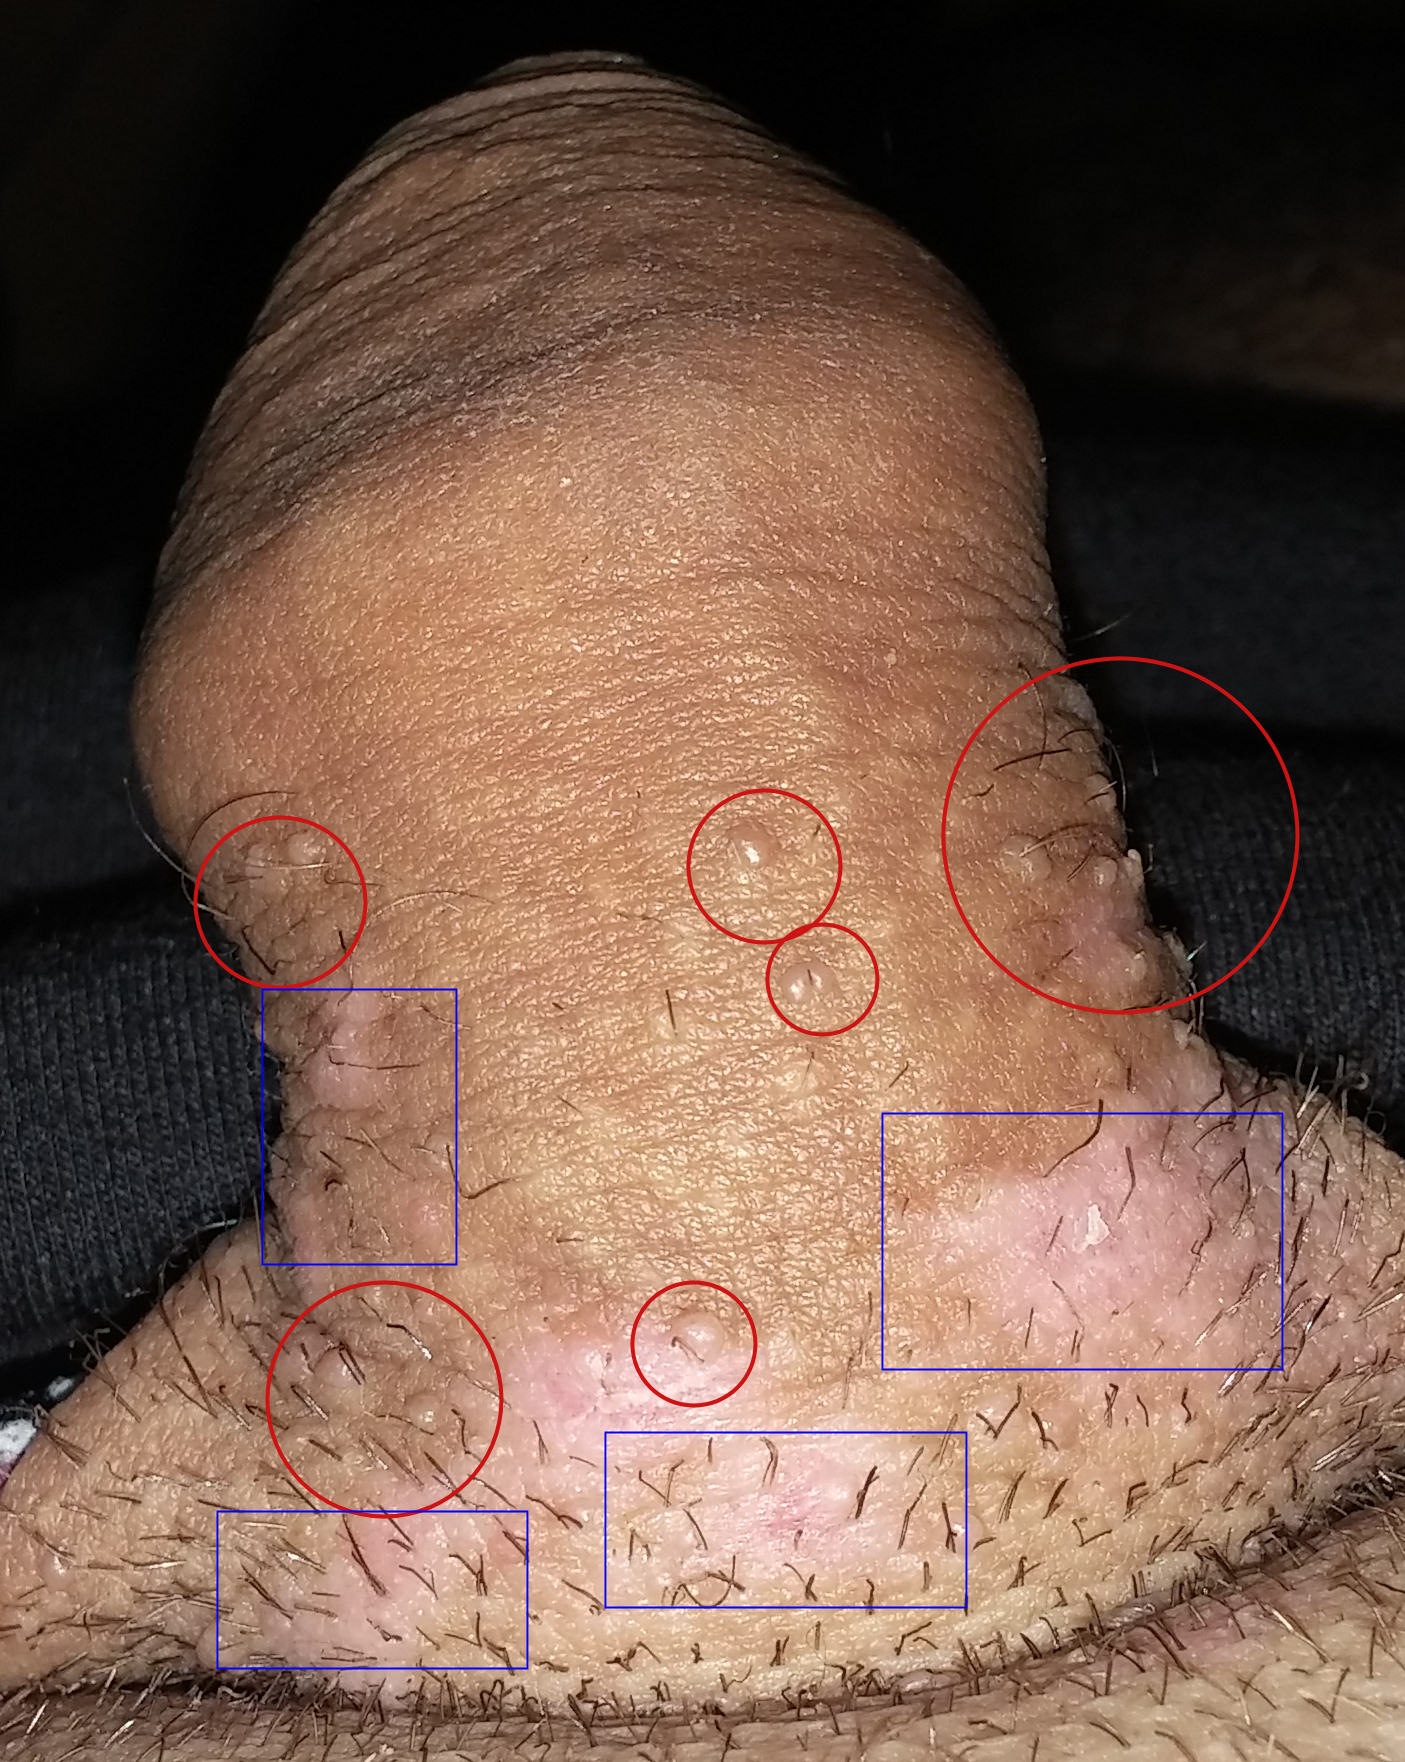 papilloma duttale maligno hpv warts hydrogen peroxide